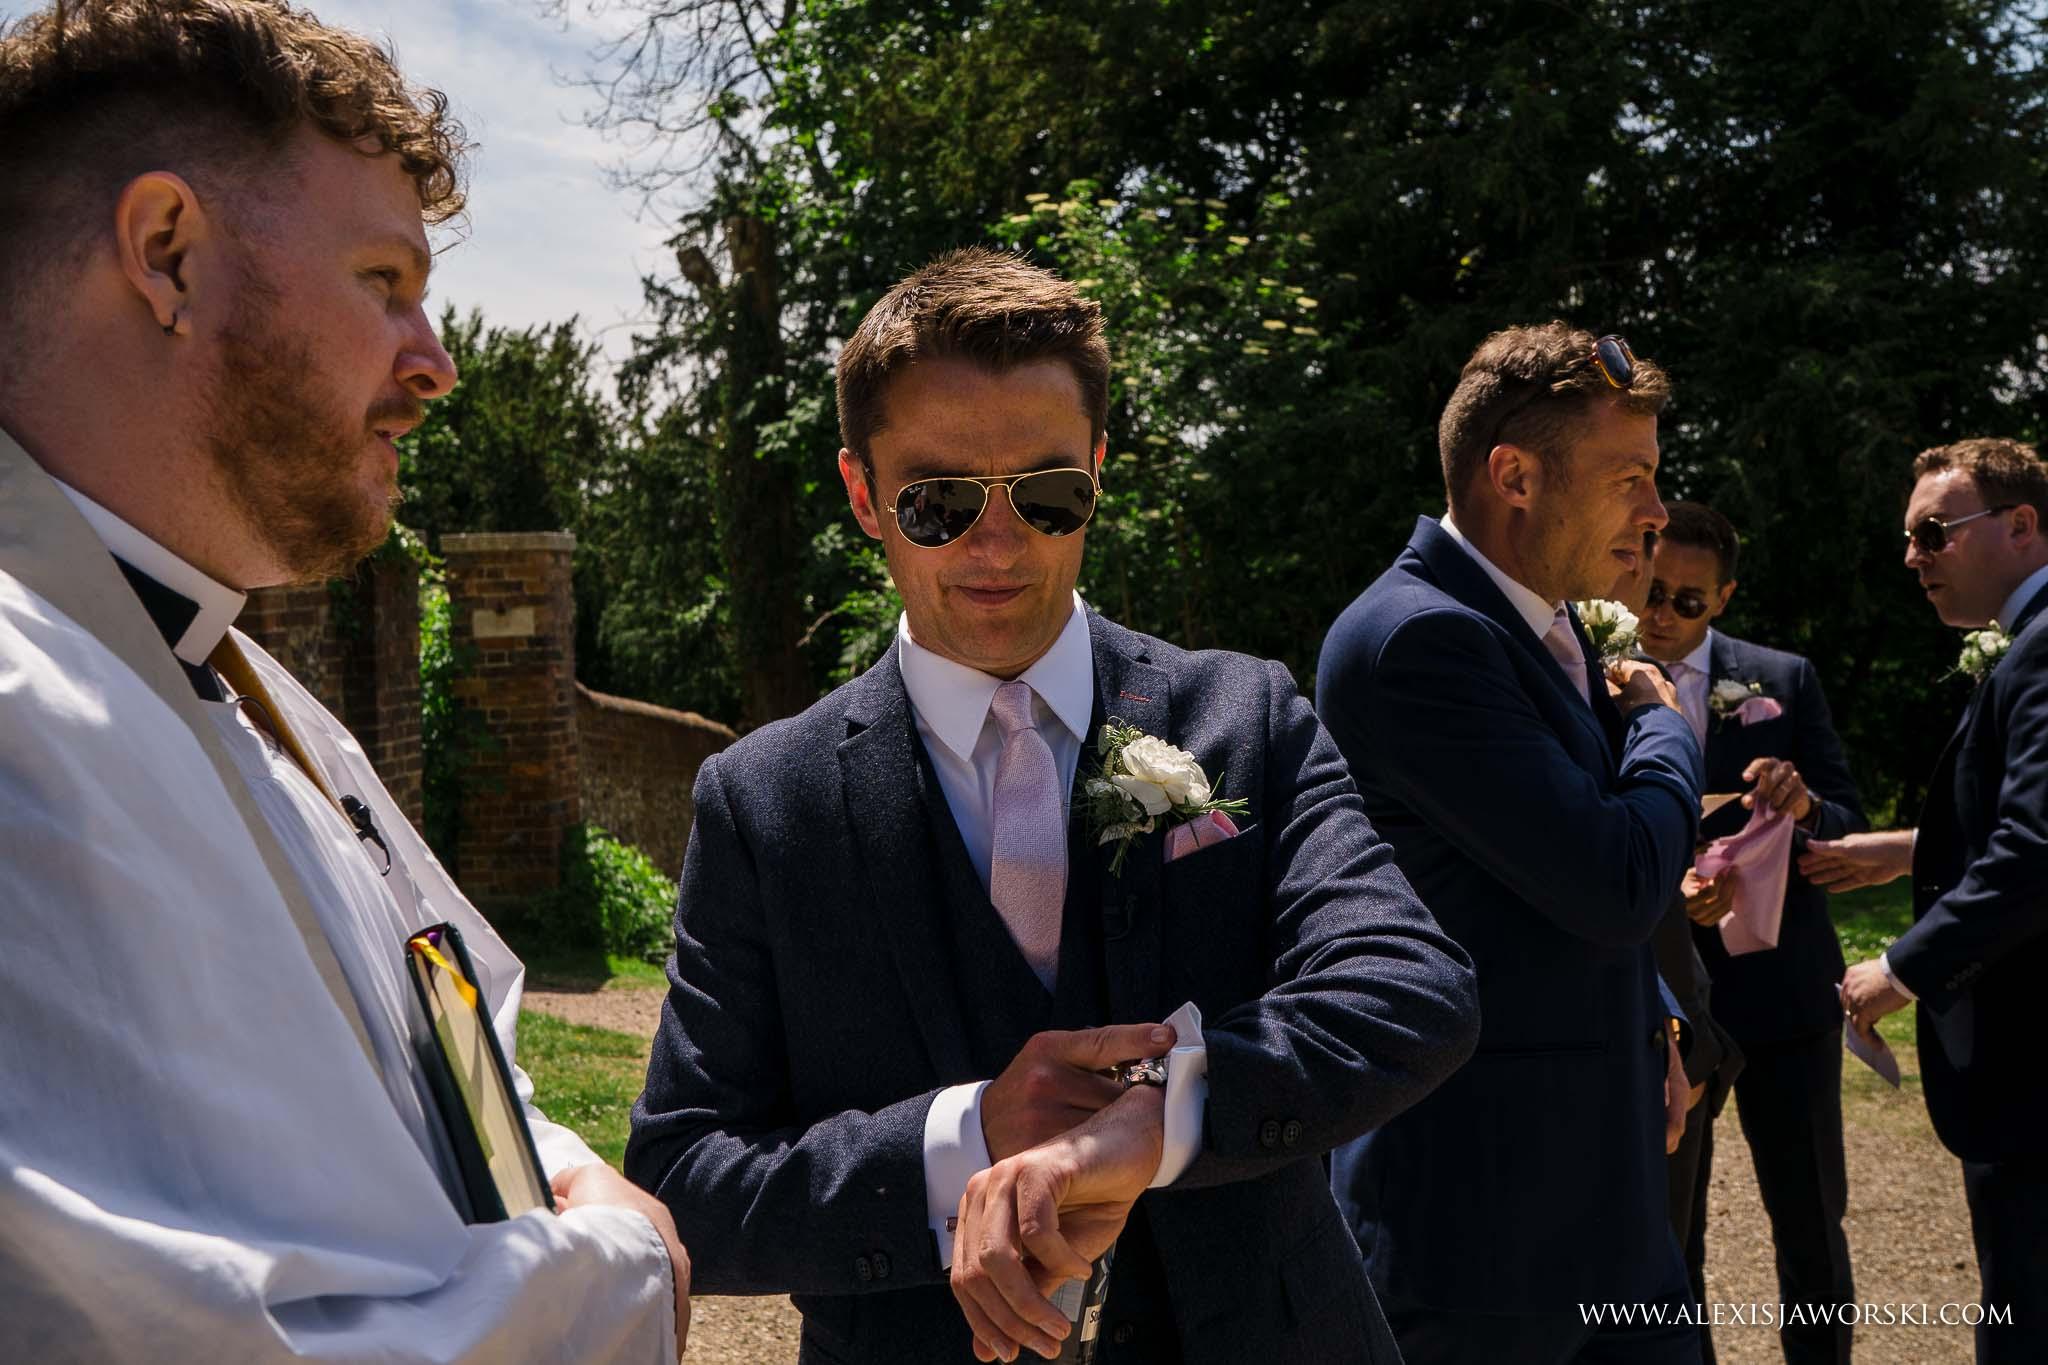 groom impatient for bride to arrive